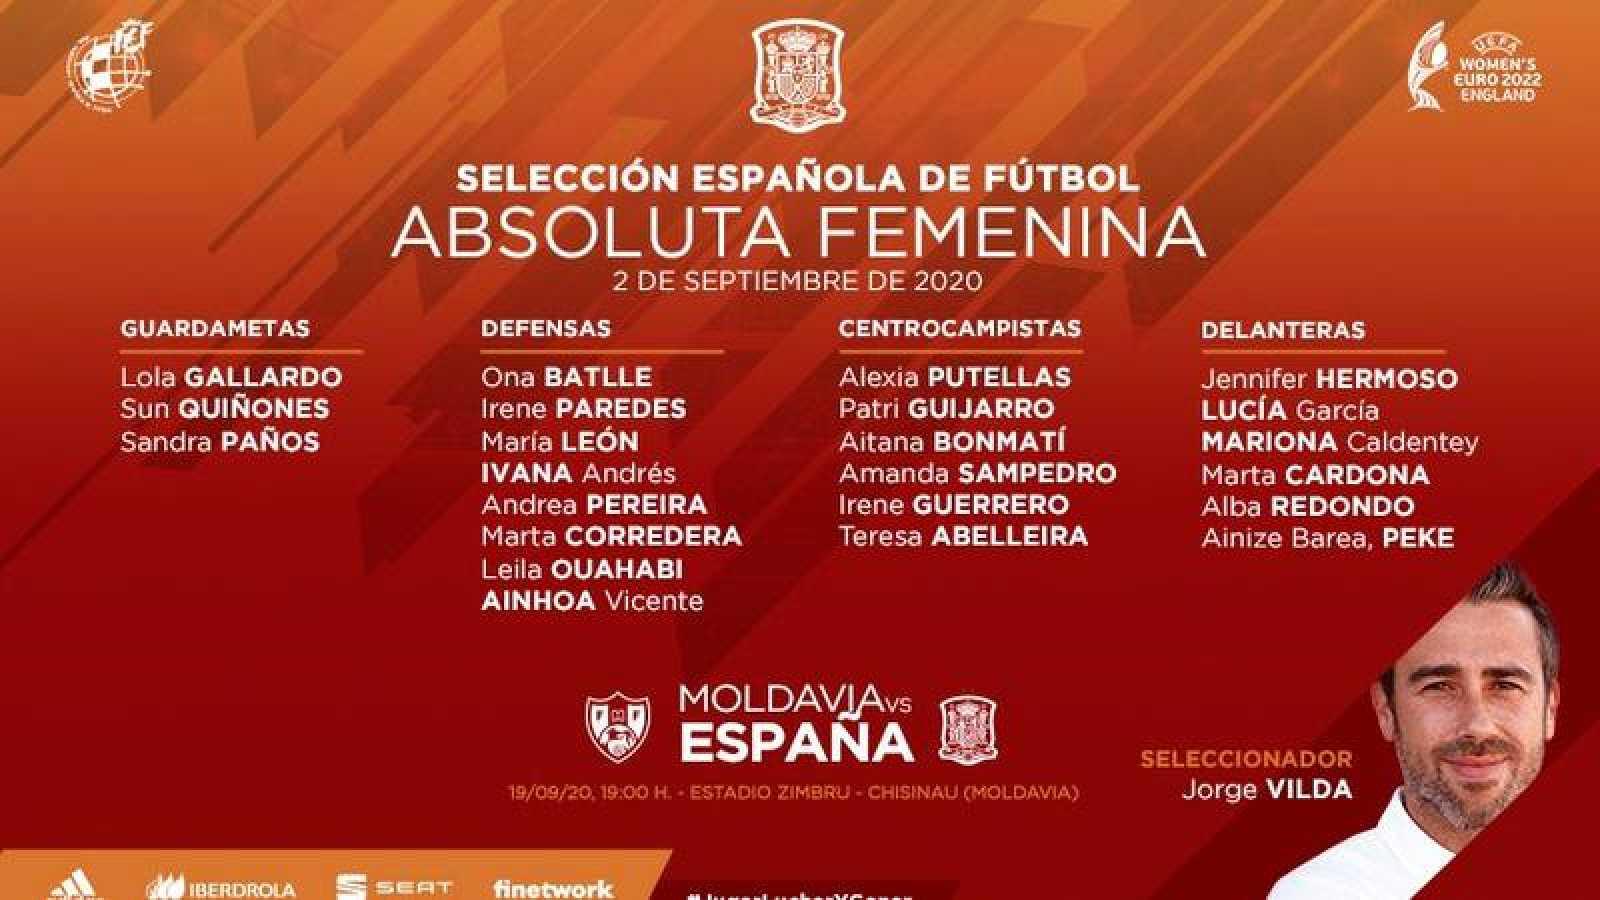 Lista de convocadas en la selección española femenina de fútbol ante Moldavia.